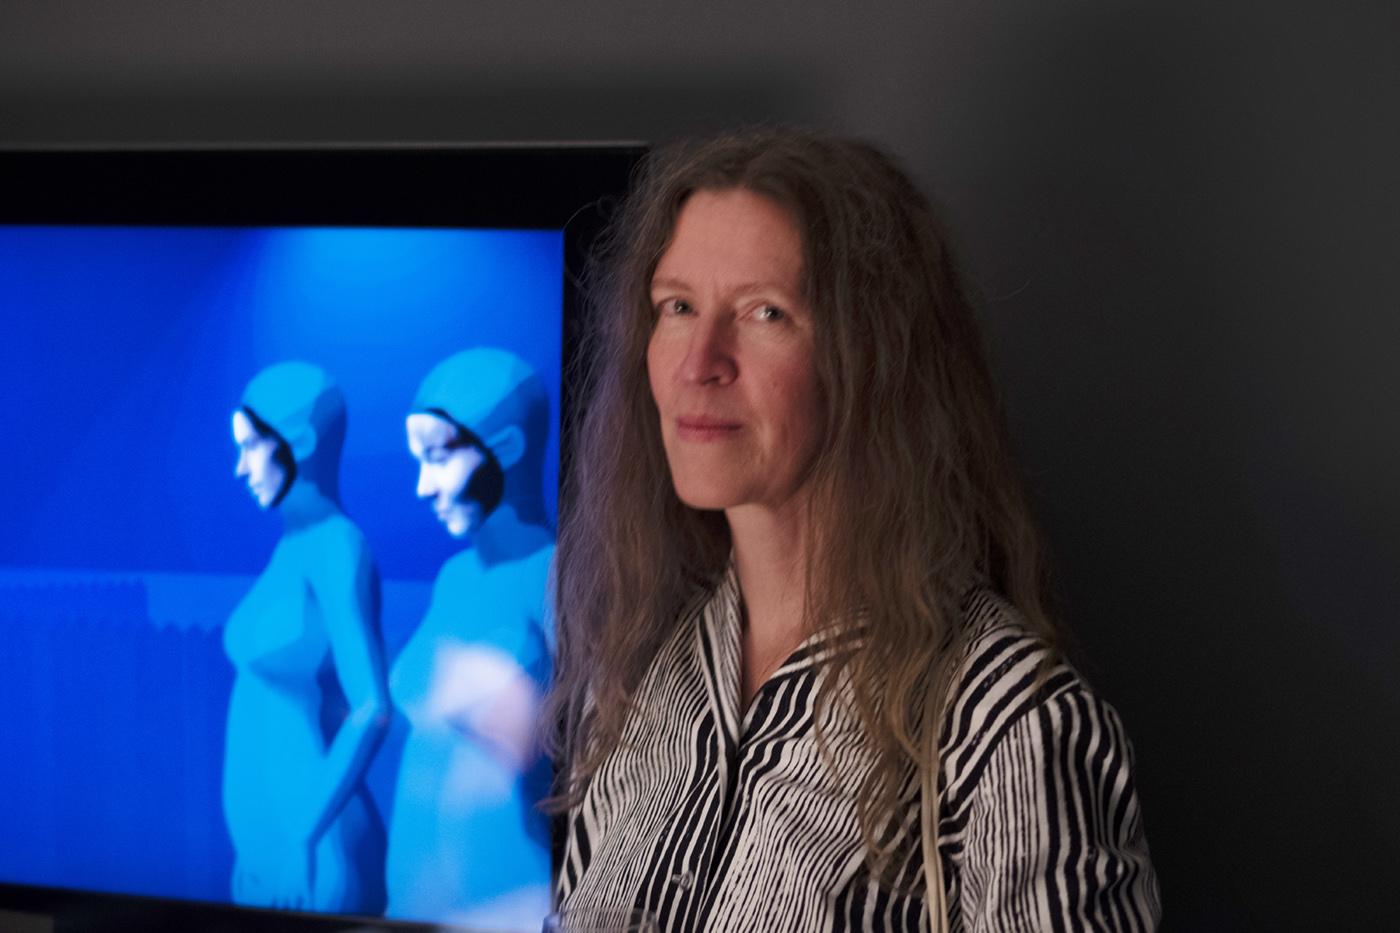 Hannah Haaslahti , taken by Graham Land, 17th October, 2018